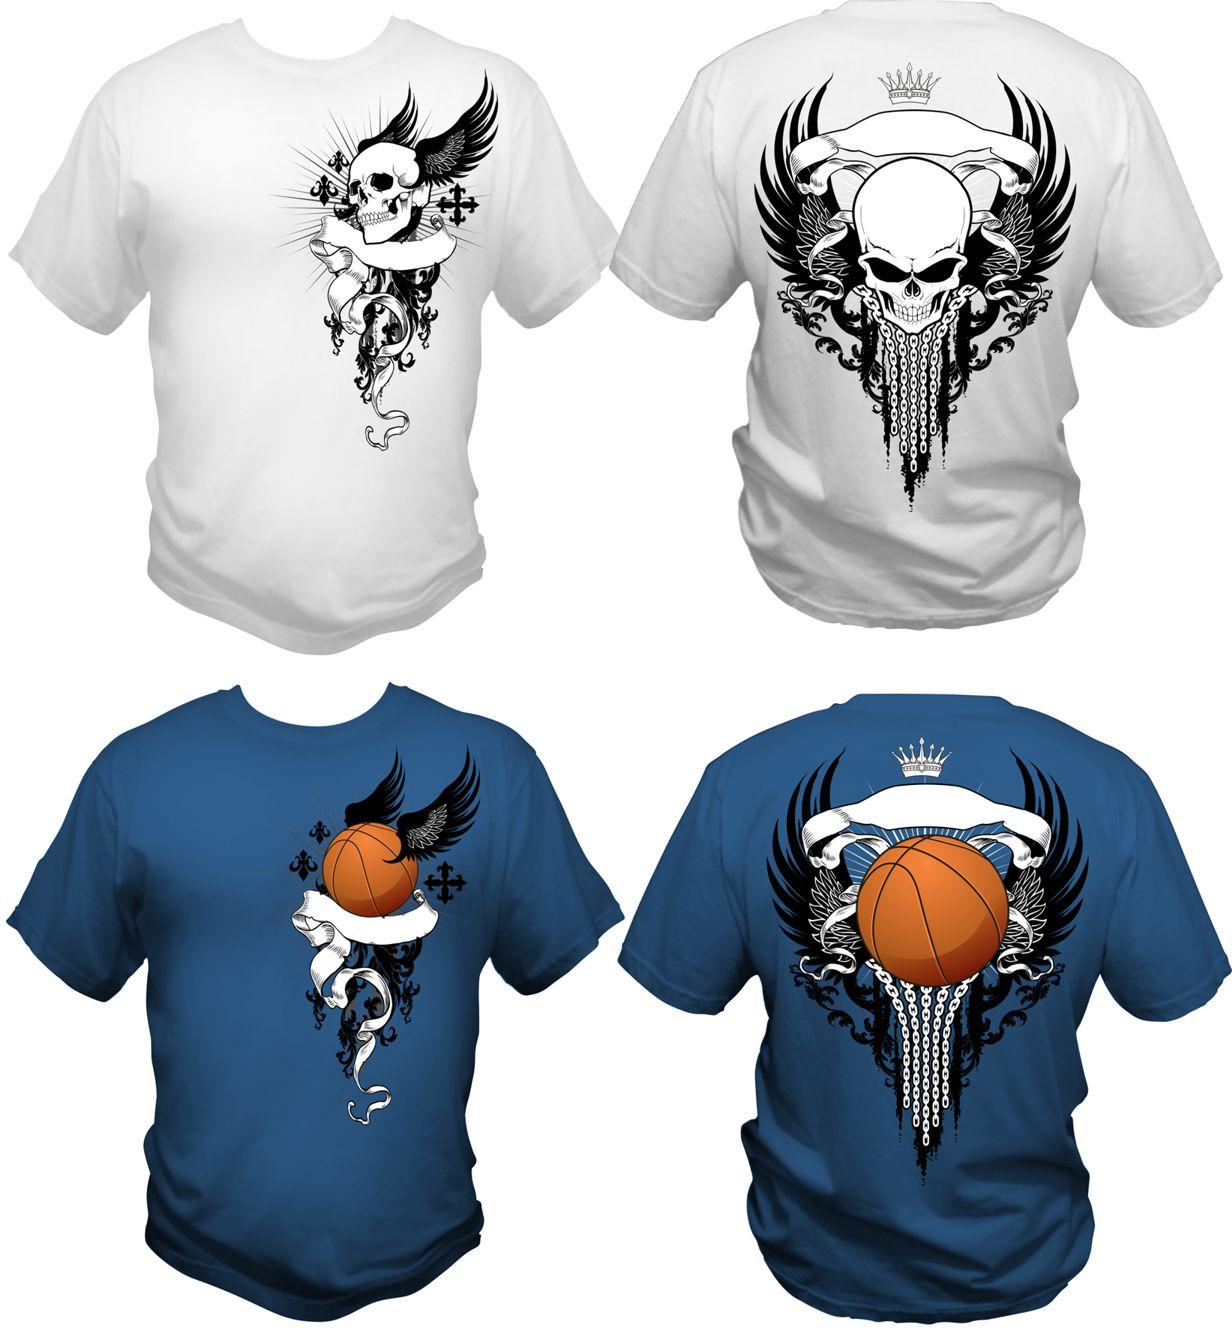 Best T Shirt Print Designs Bcd Tofu House